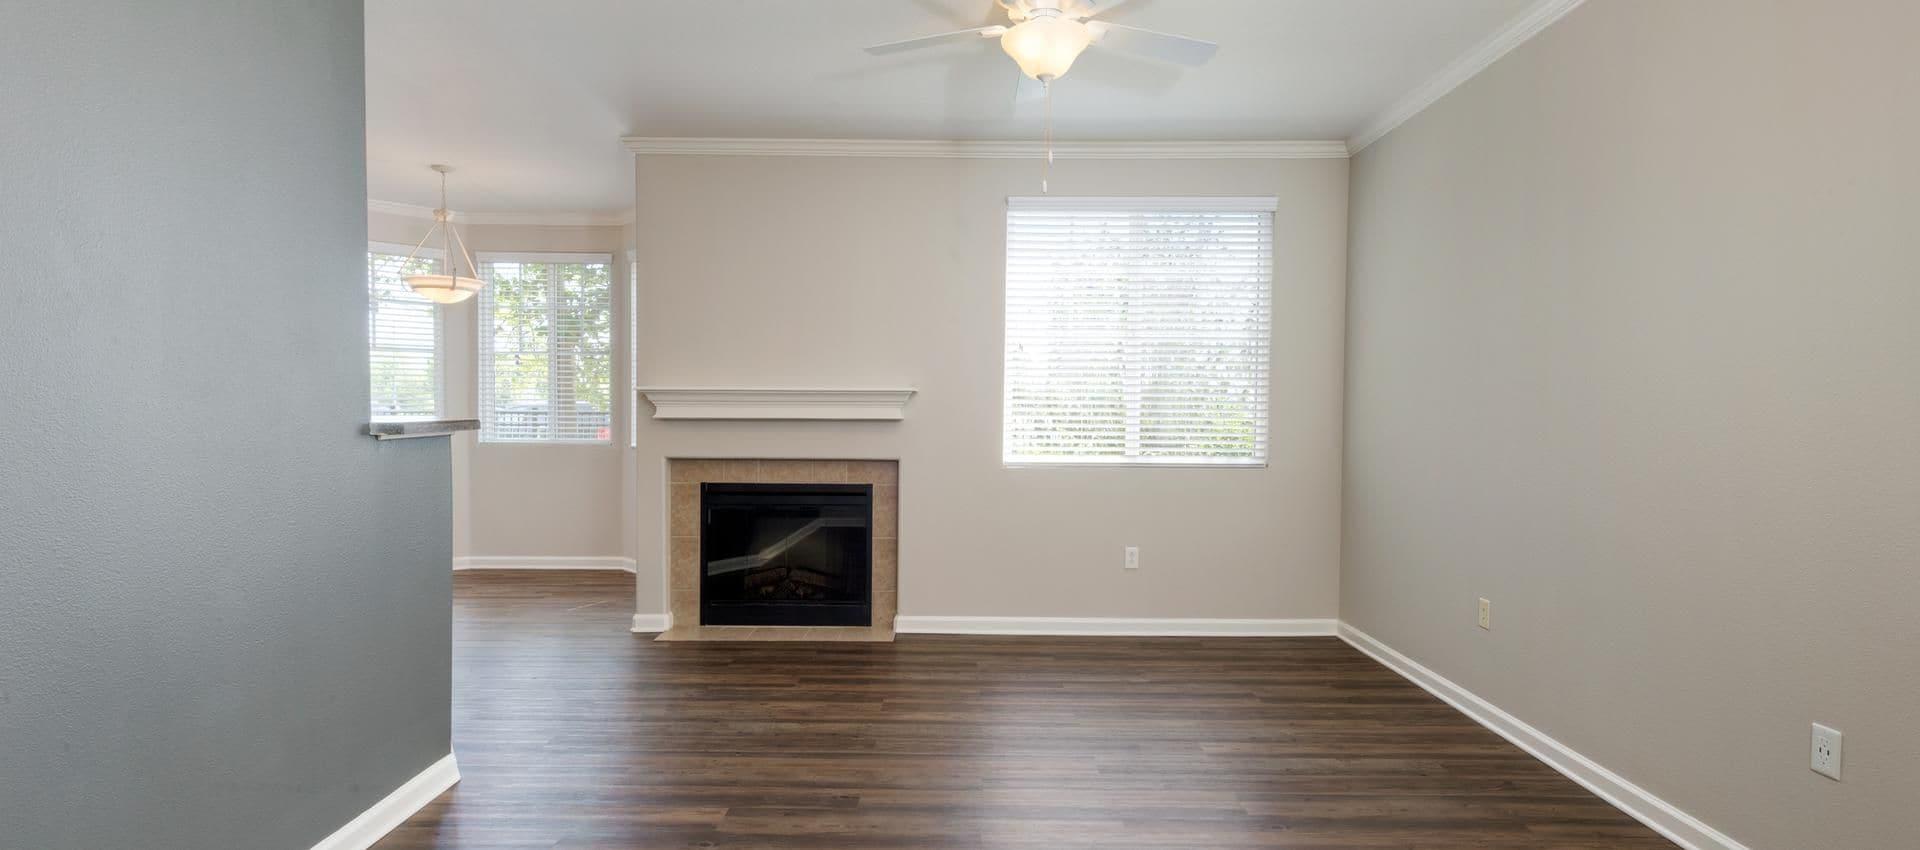 The Artisan Apartment Homes's Living Room in Sacramento, CA